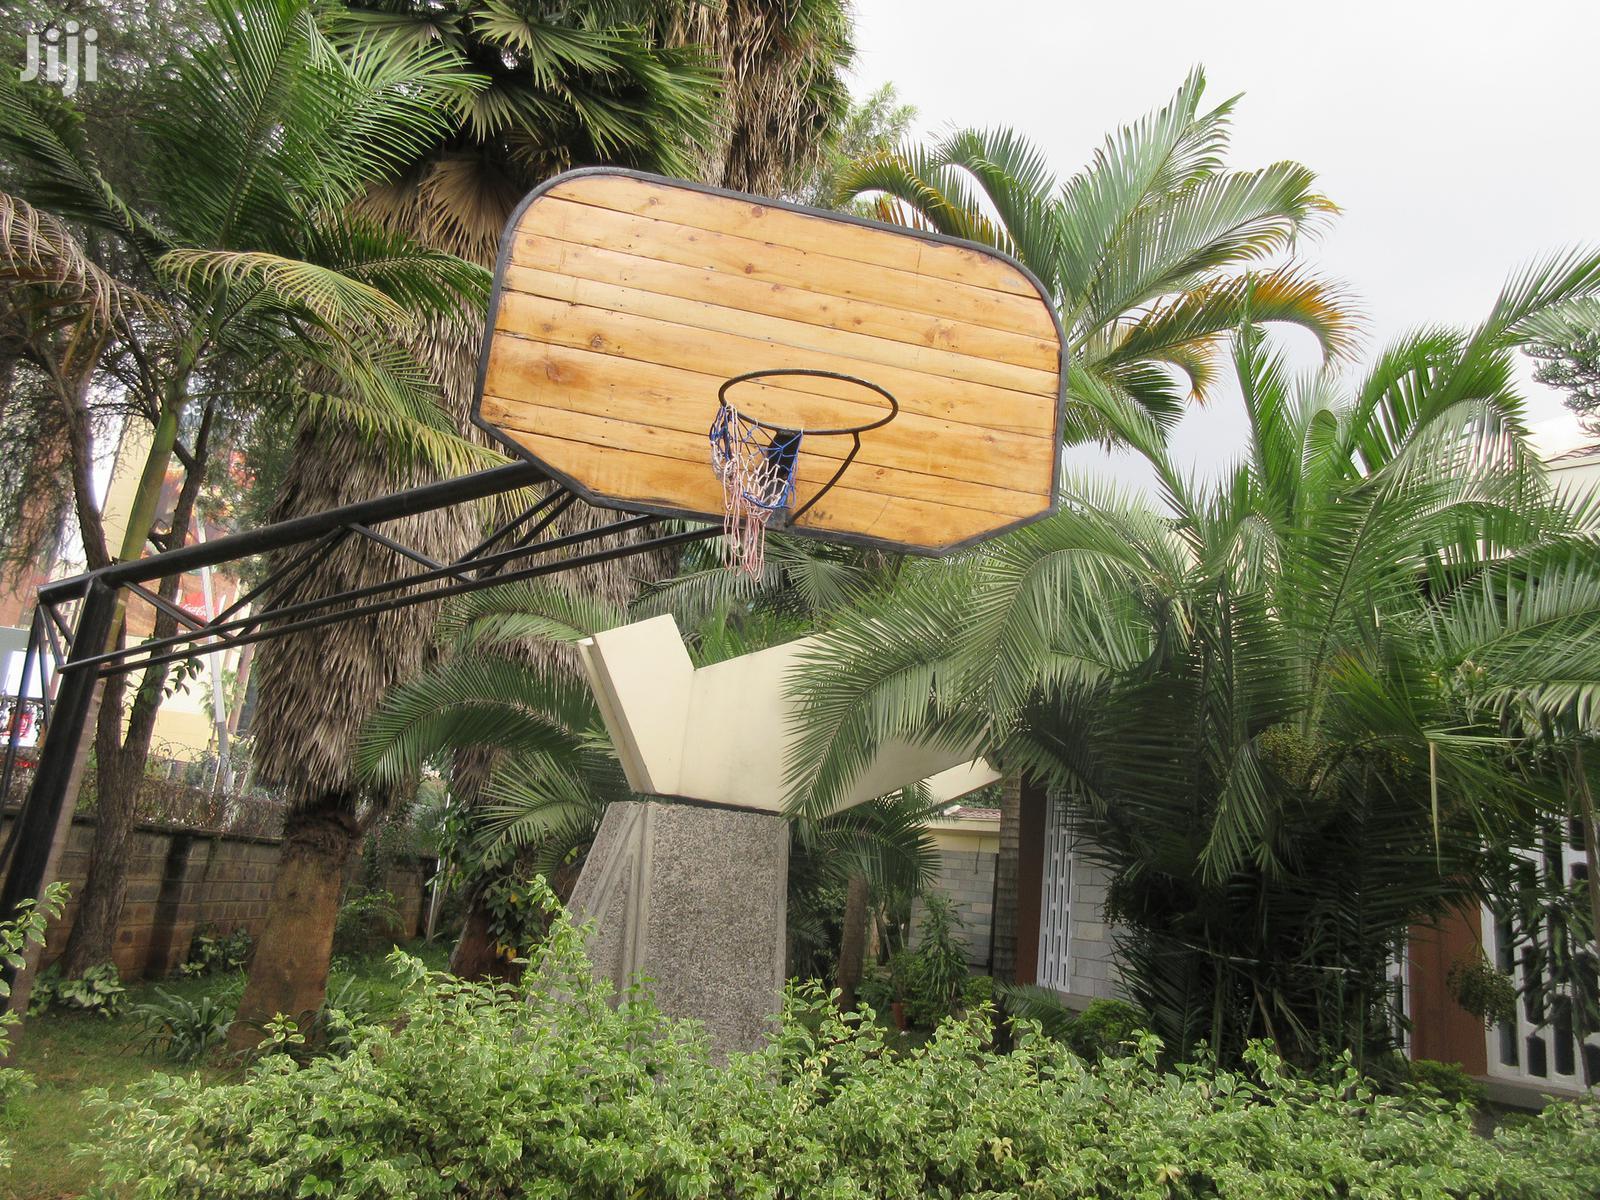 Basket Ball Court Hoop Construction And Set Up. | Sports Equipment for sale in Nairobi Central, Nairobi, Kenya